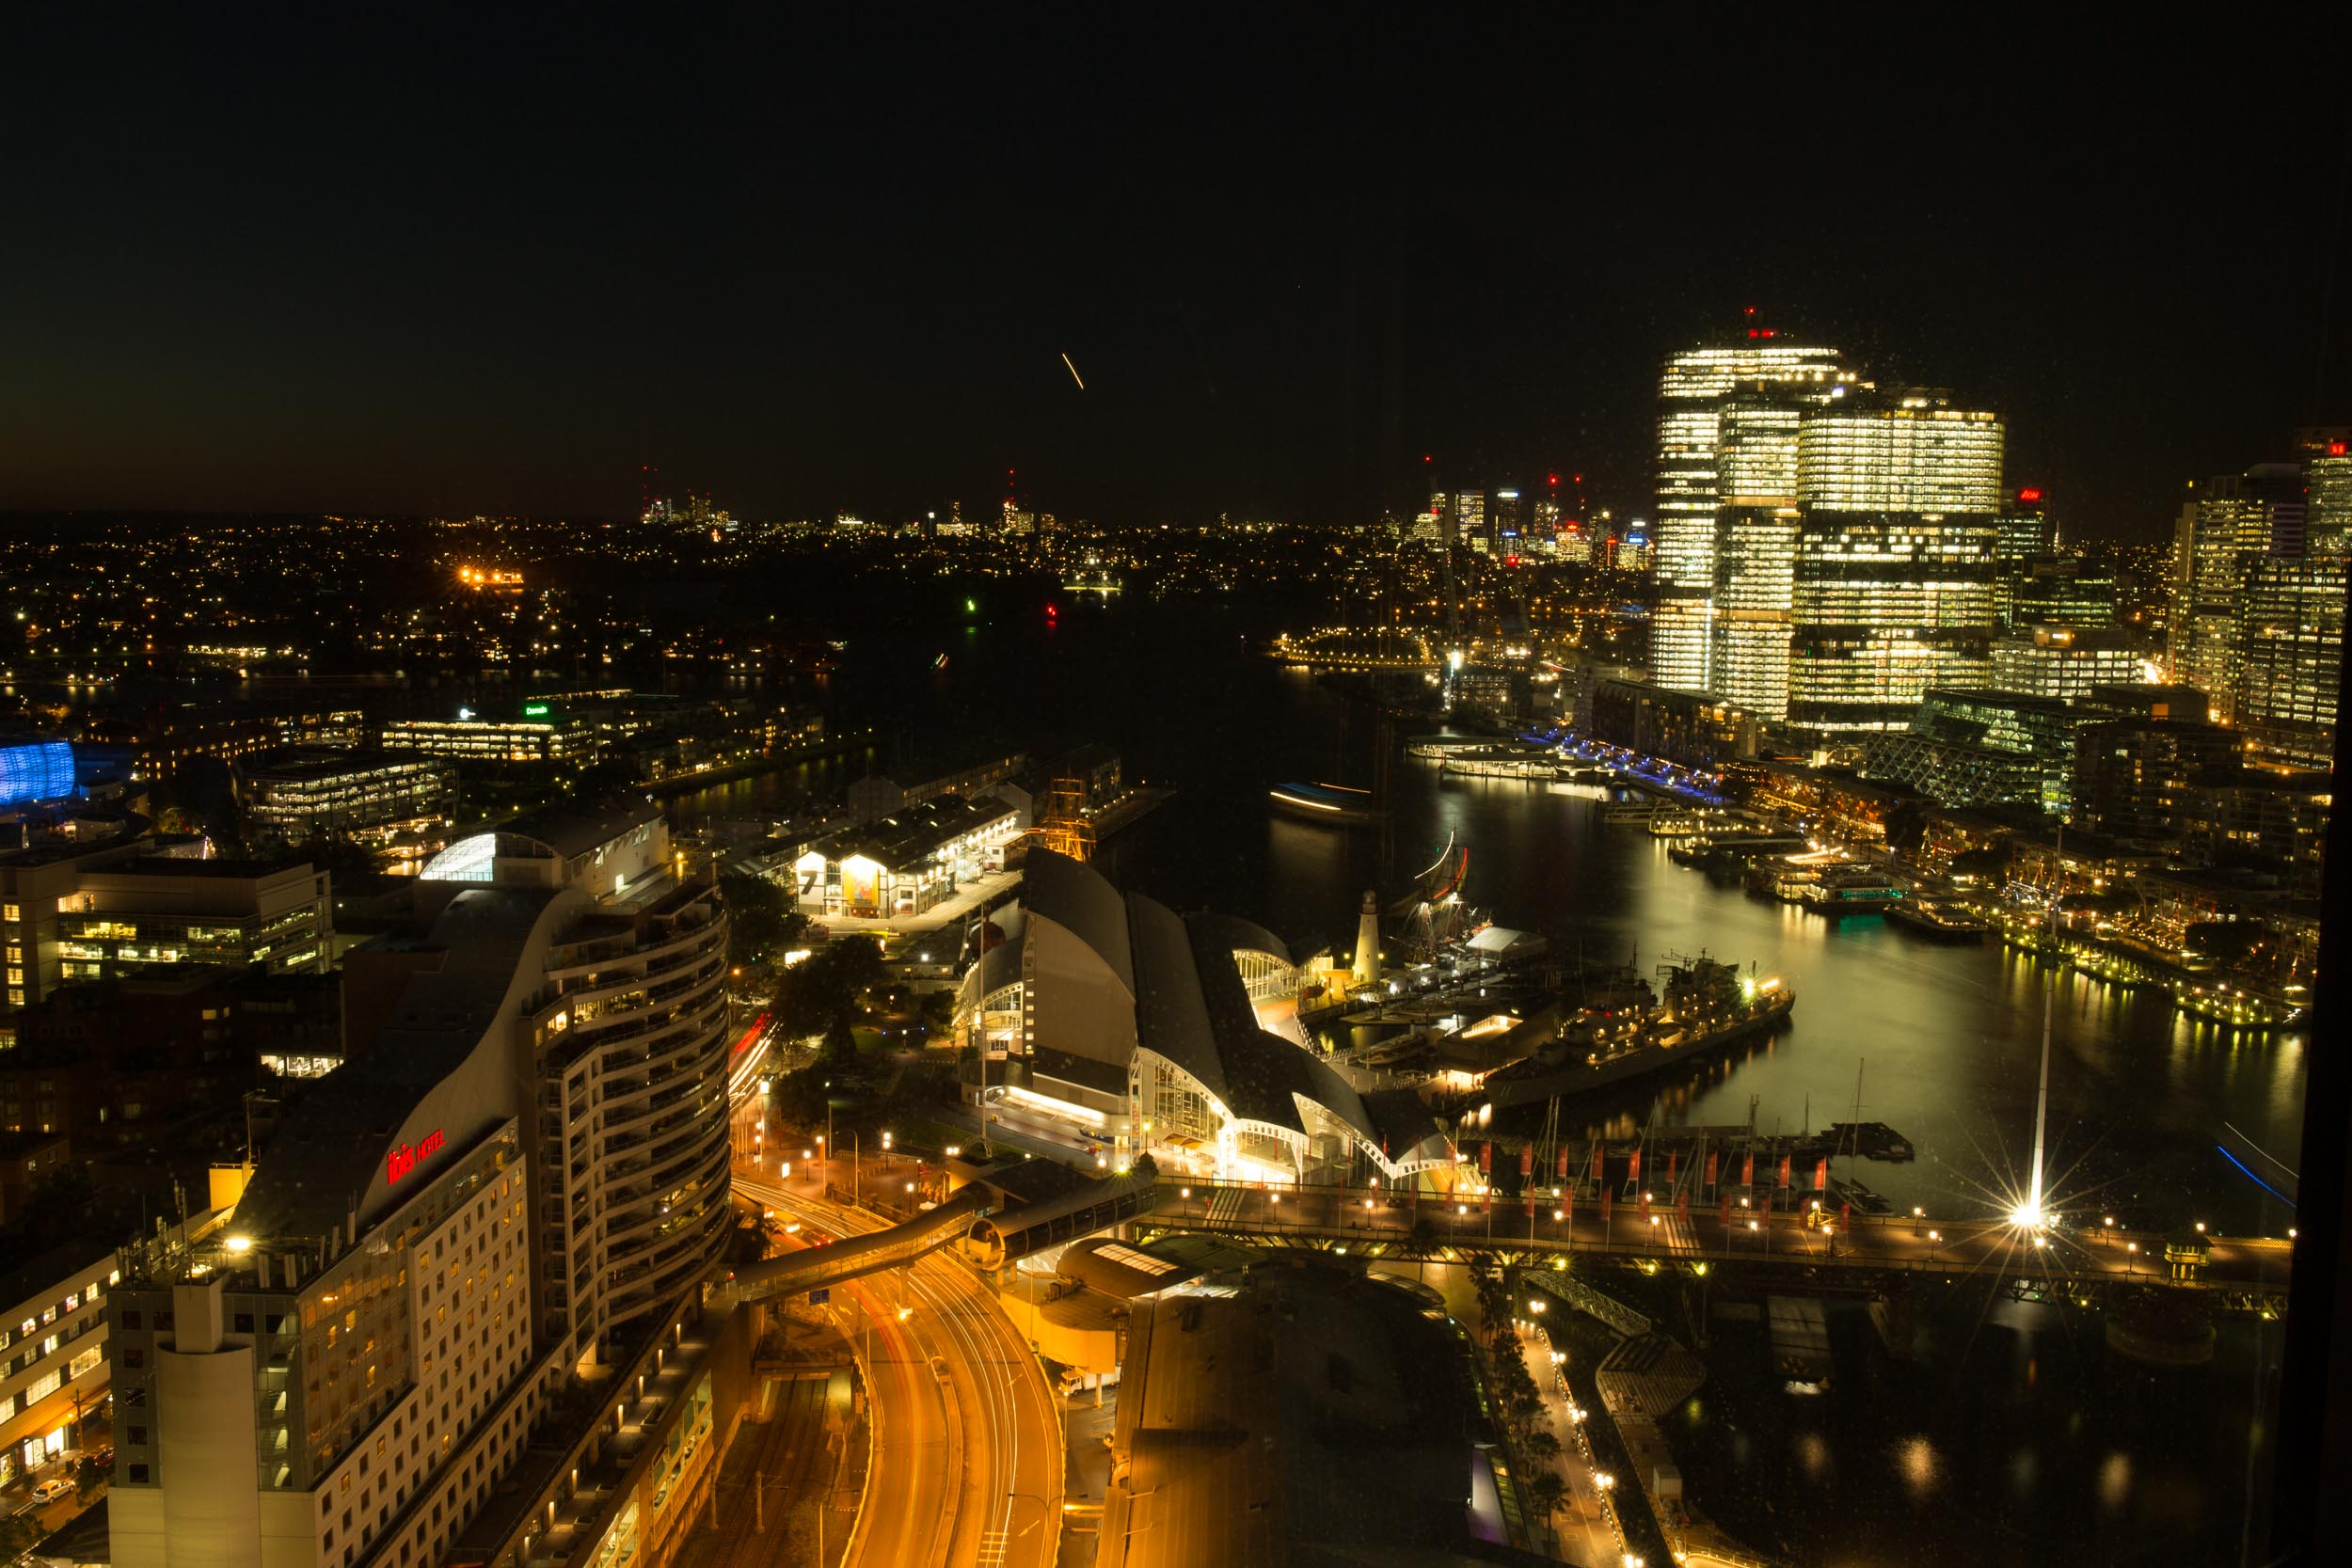 Sofitel Sydney Darling Harbour (Evening view over Darling Harbour) (2).jpg